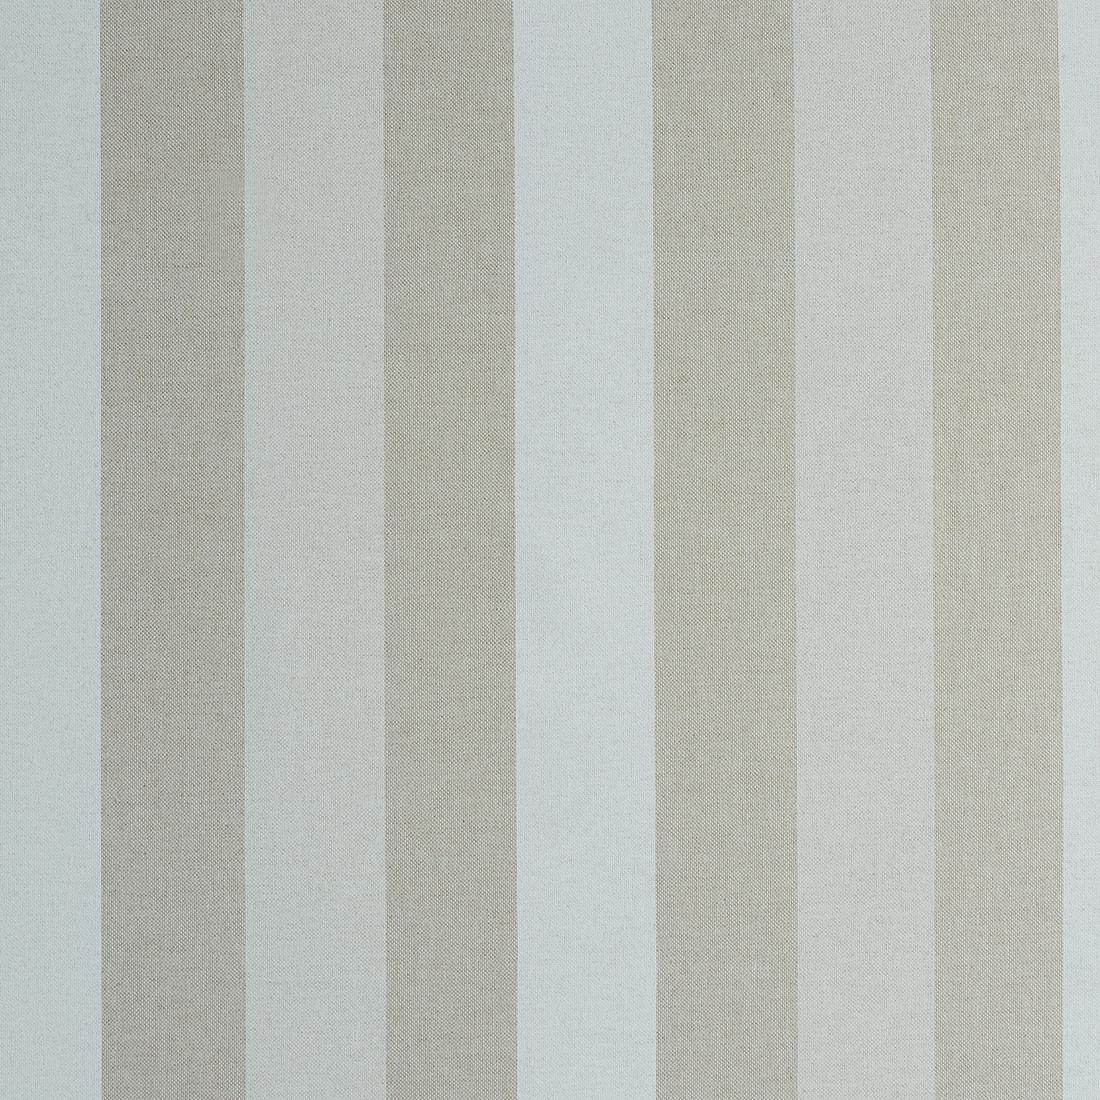 Linen Stripe Linen